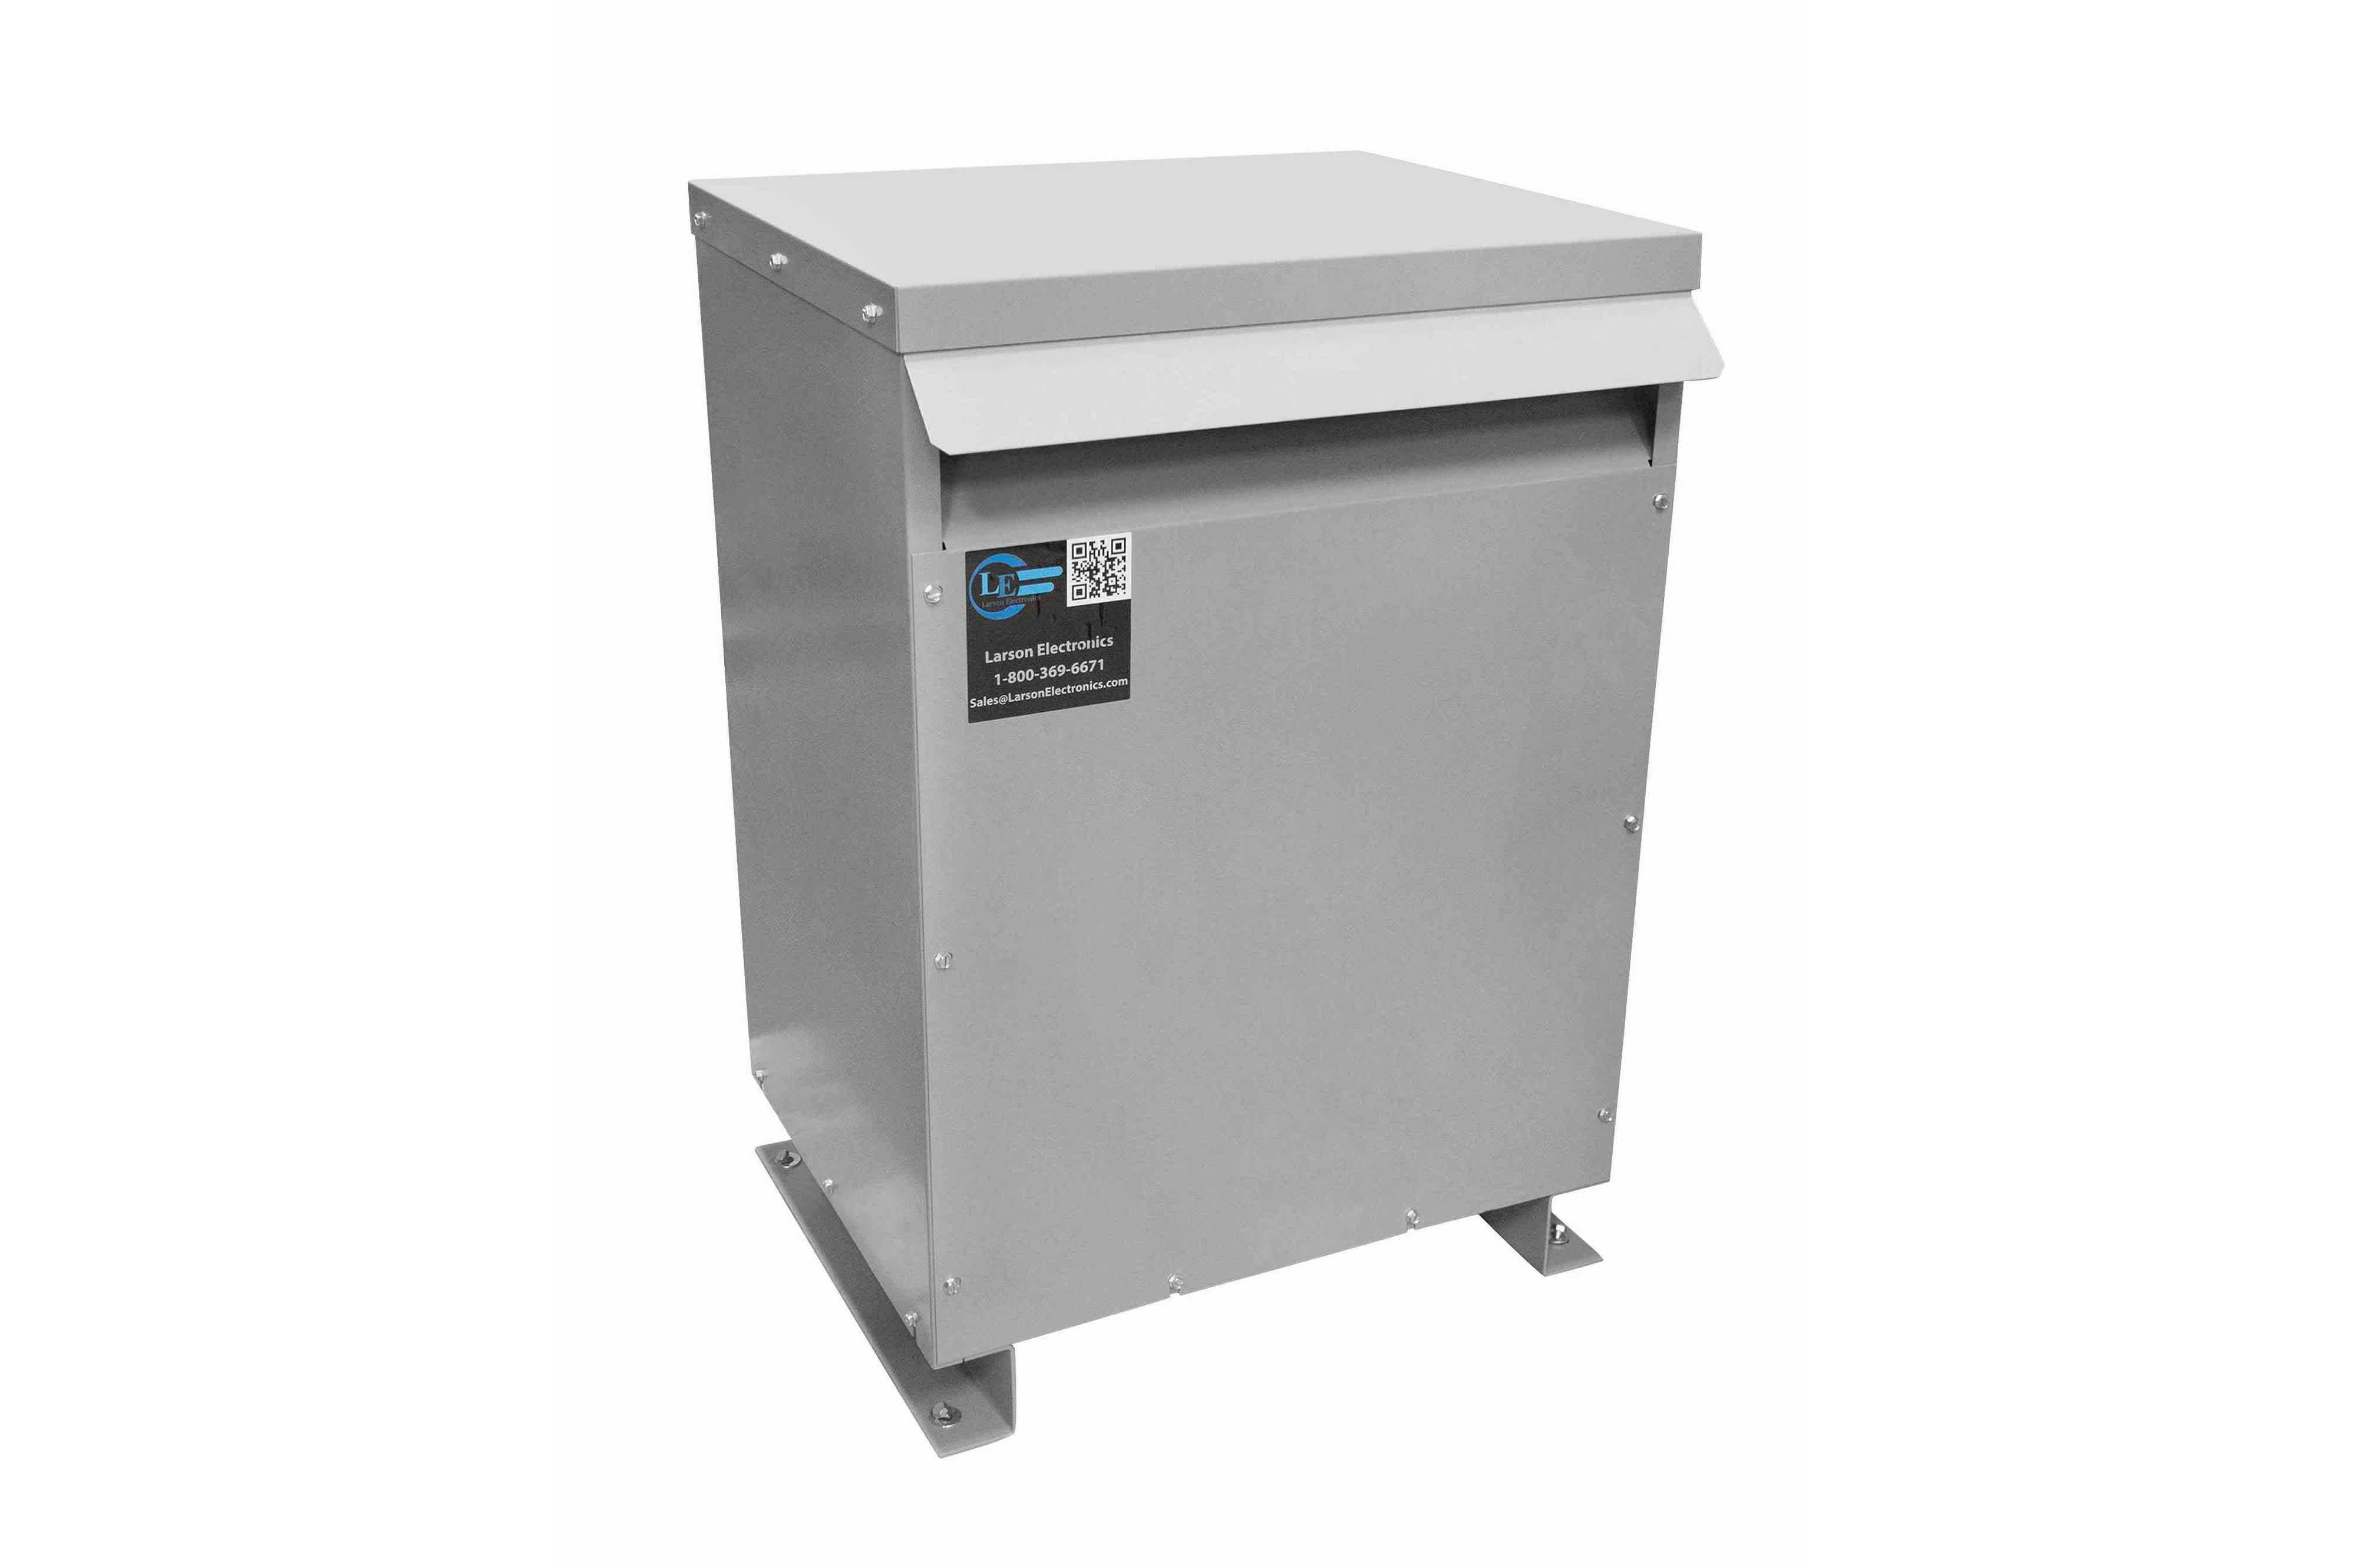 60 kVA 3PH Isolation Transformer, 208V Wye Primary, 400V Delta Secondary, N3R, Ventilated, 60 Hz